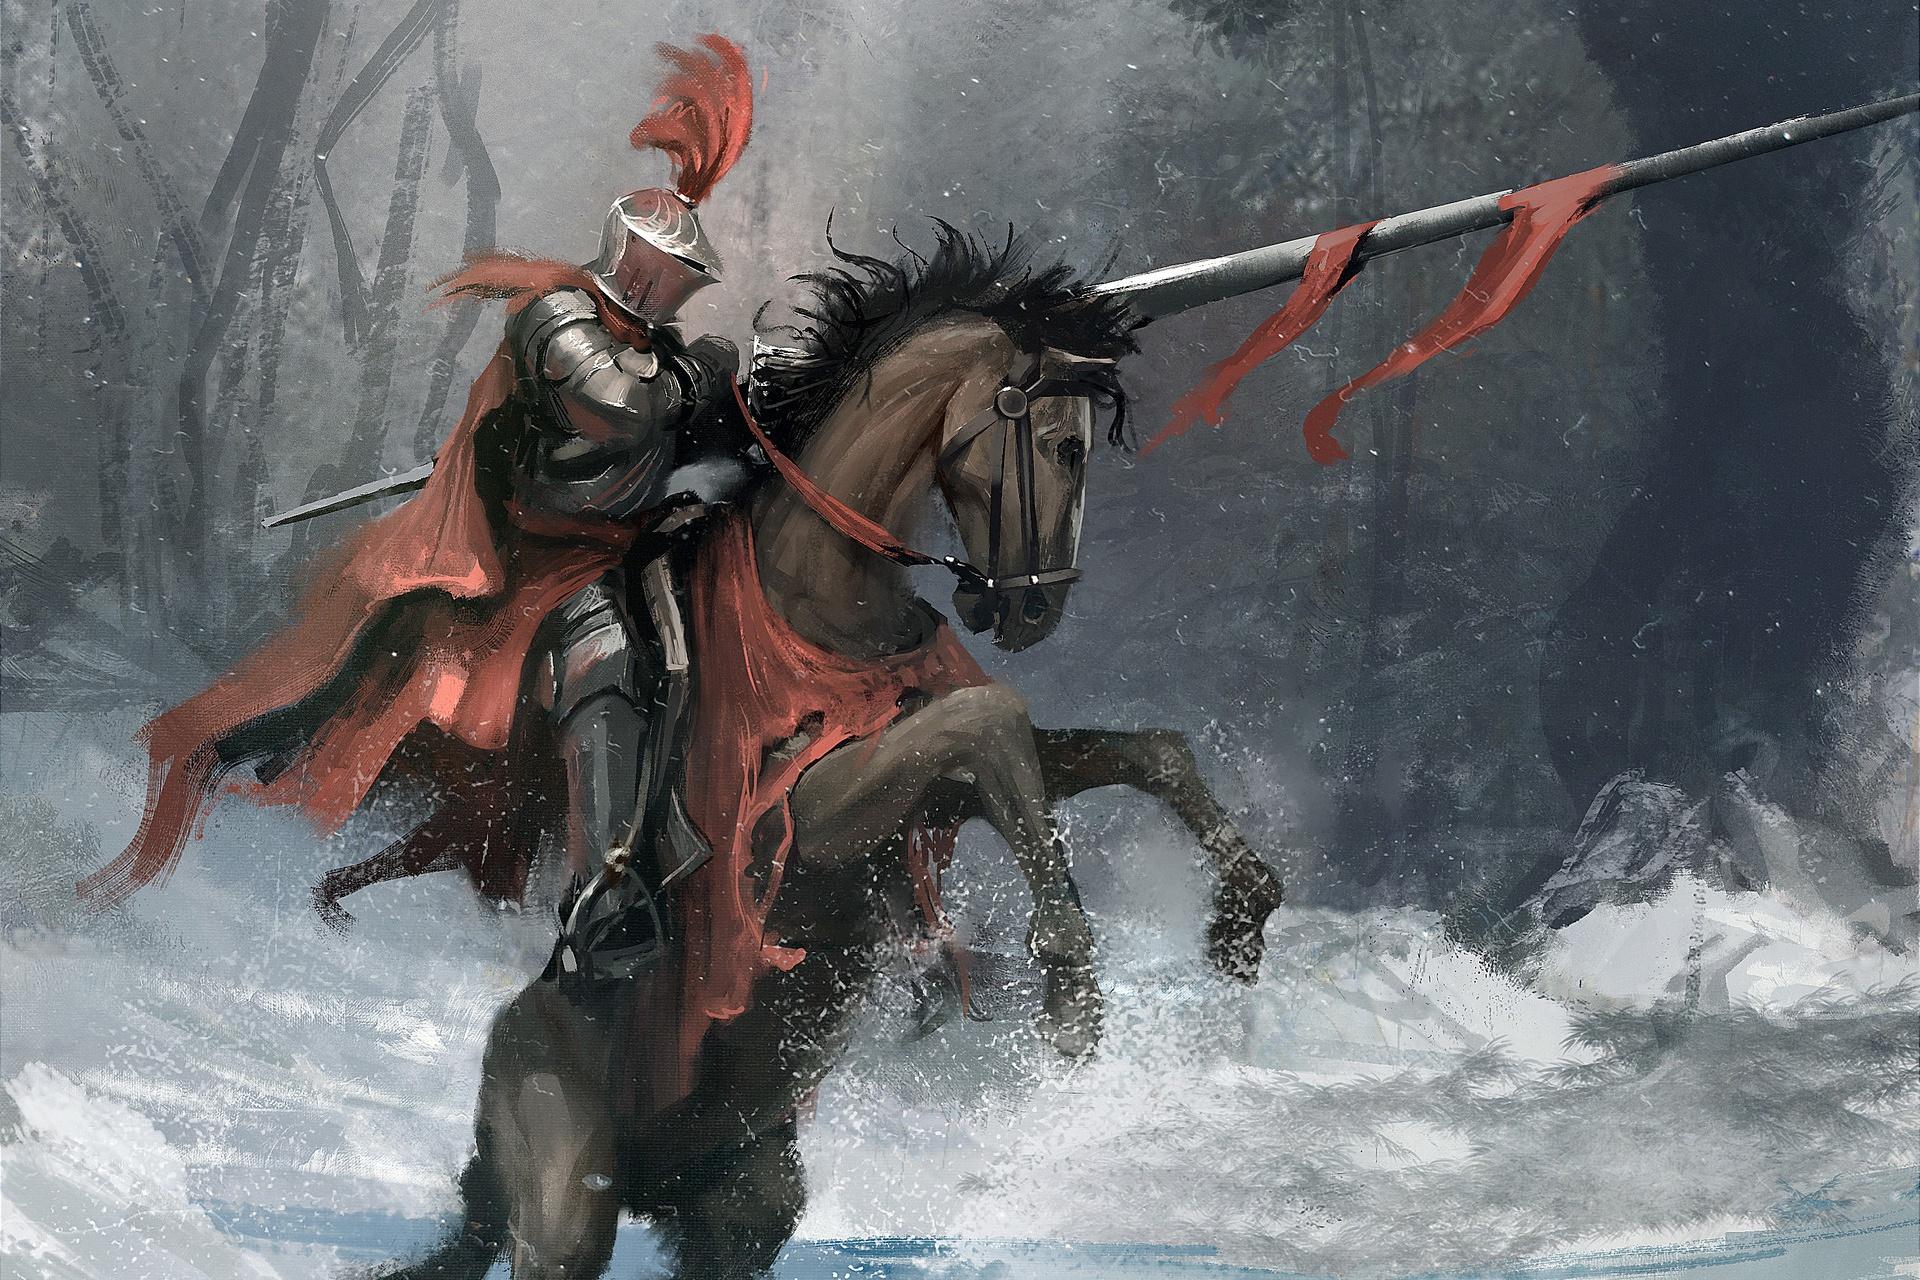 wallpaper horse knight fantasy men winter snow. Black Bedroom Furniture Sets. Home Design Ideas